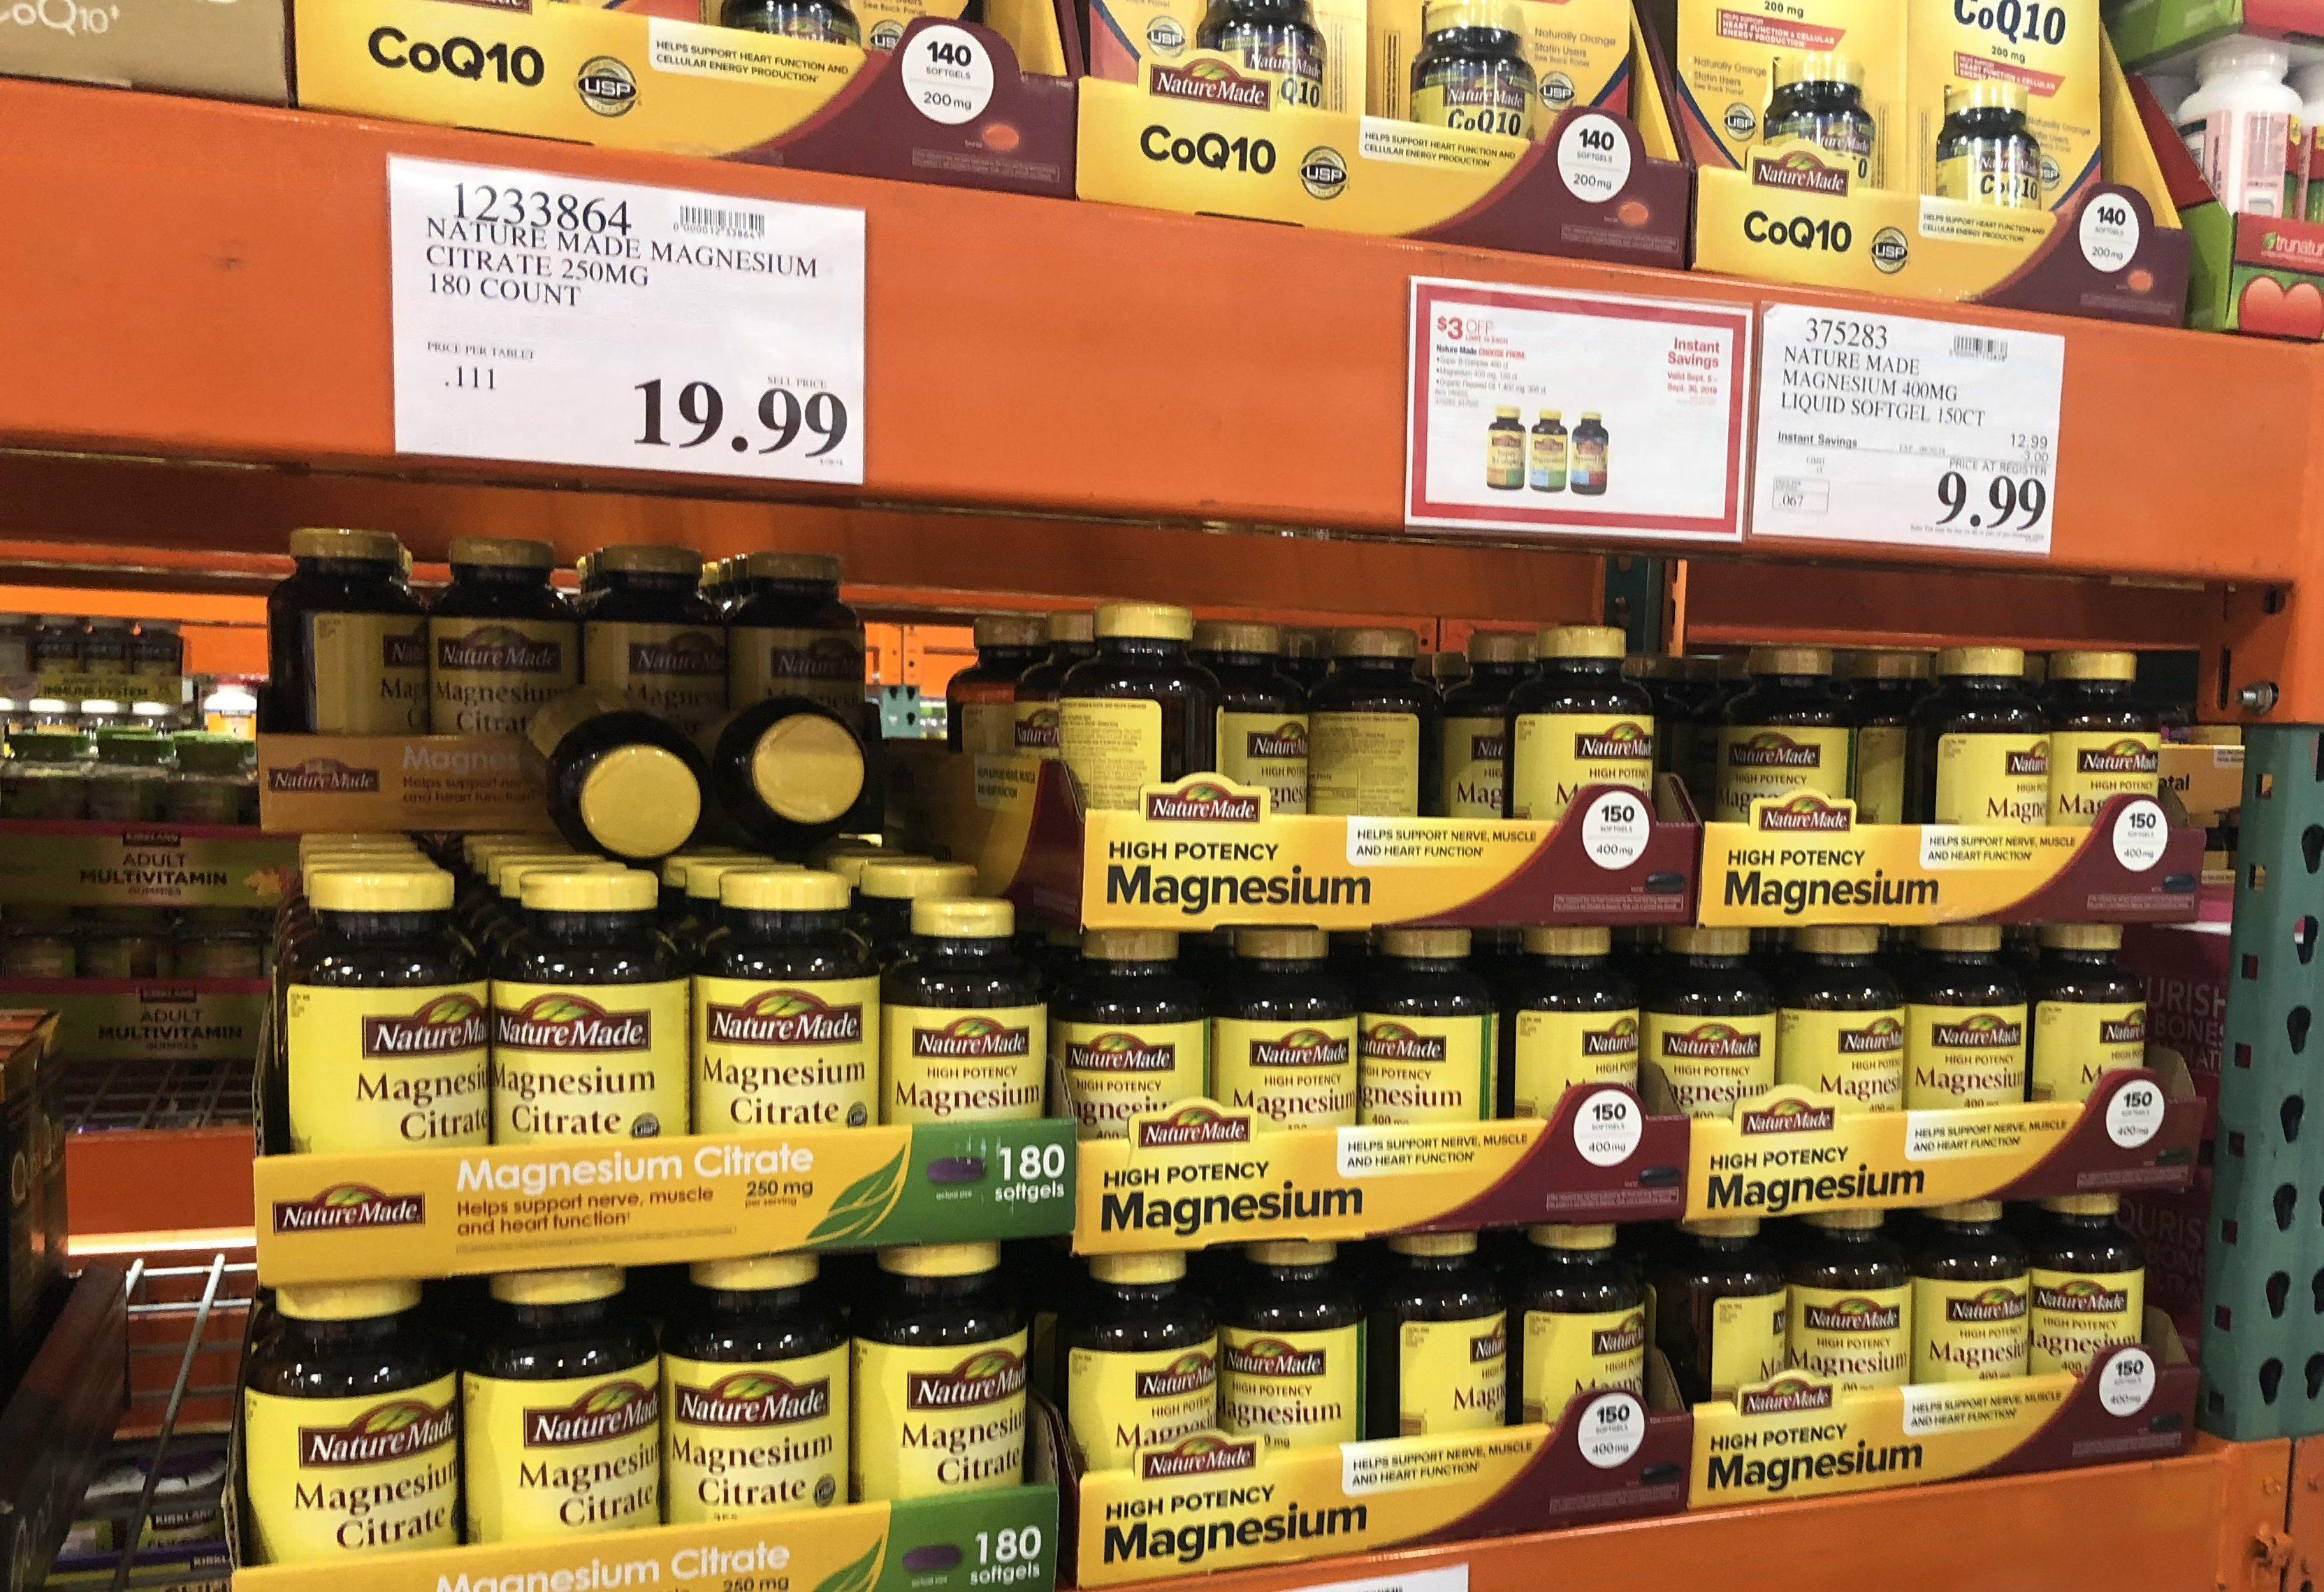 keto costco deals September 2018 – Nature Made Magnesium at Costco